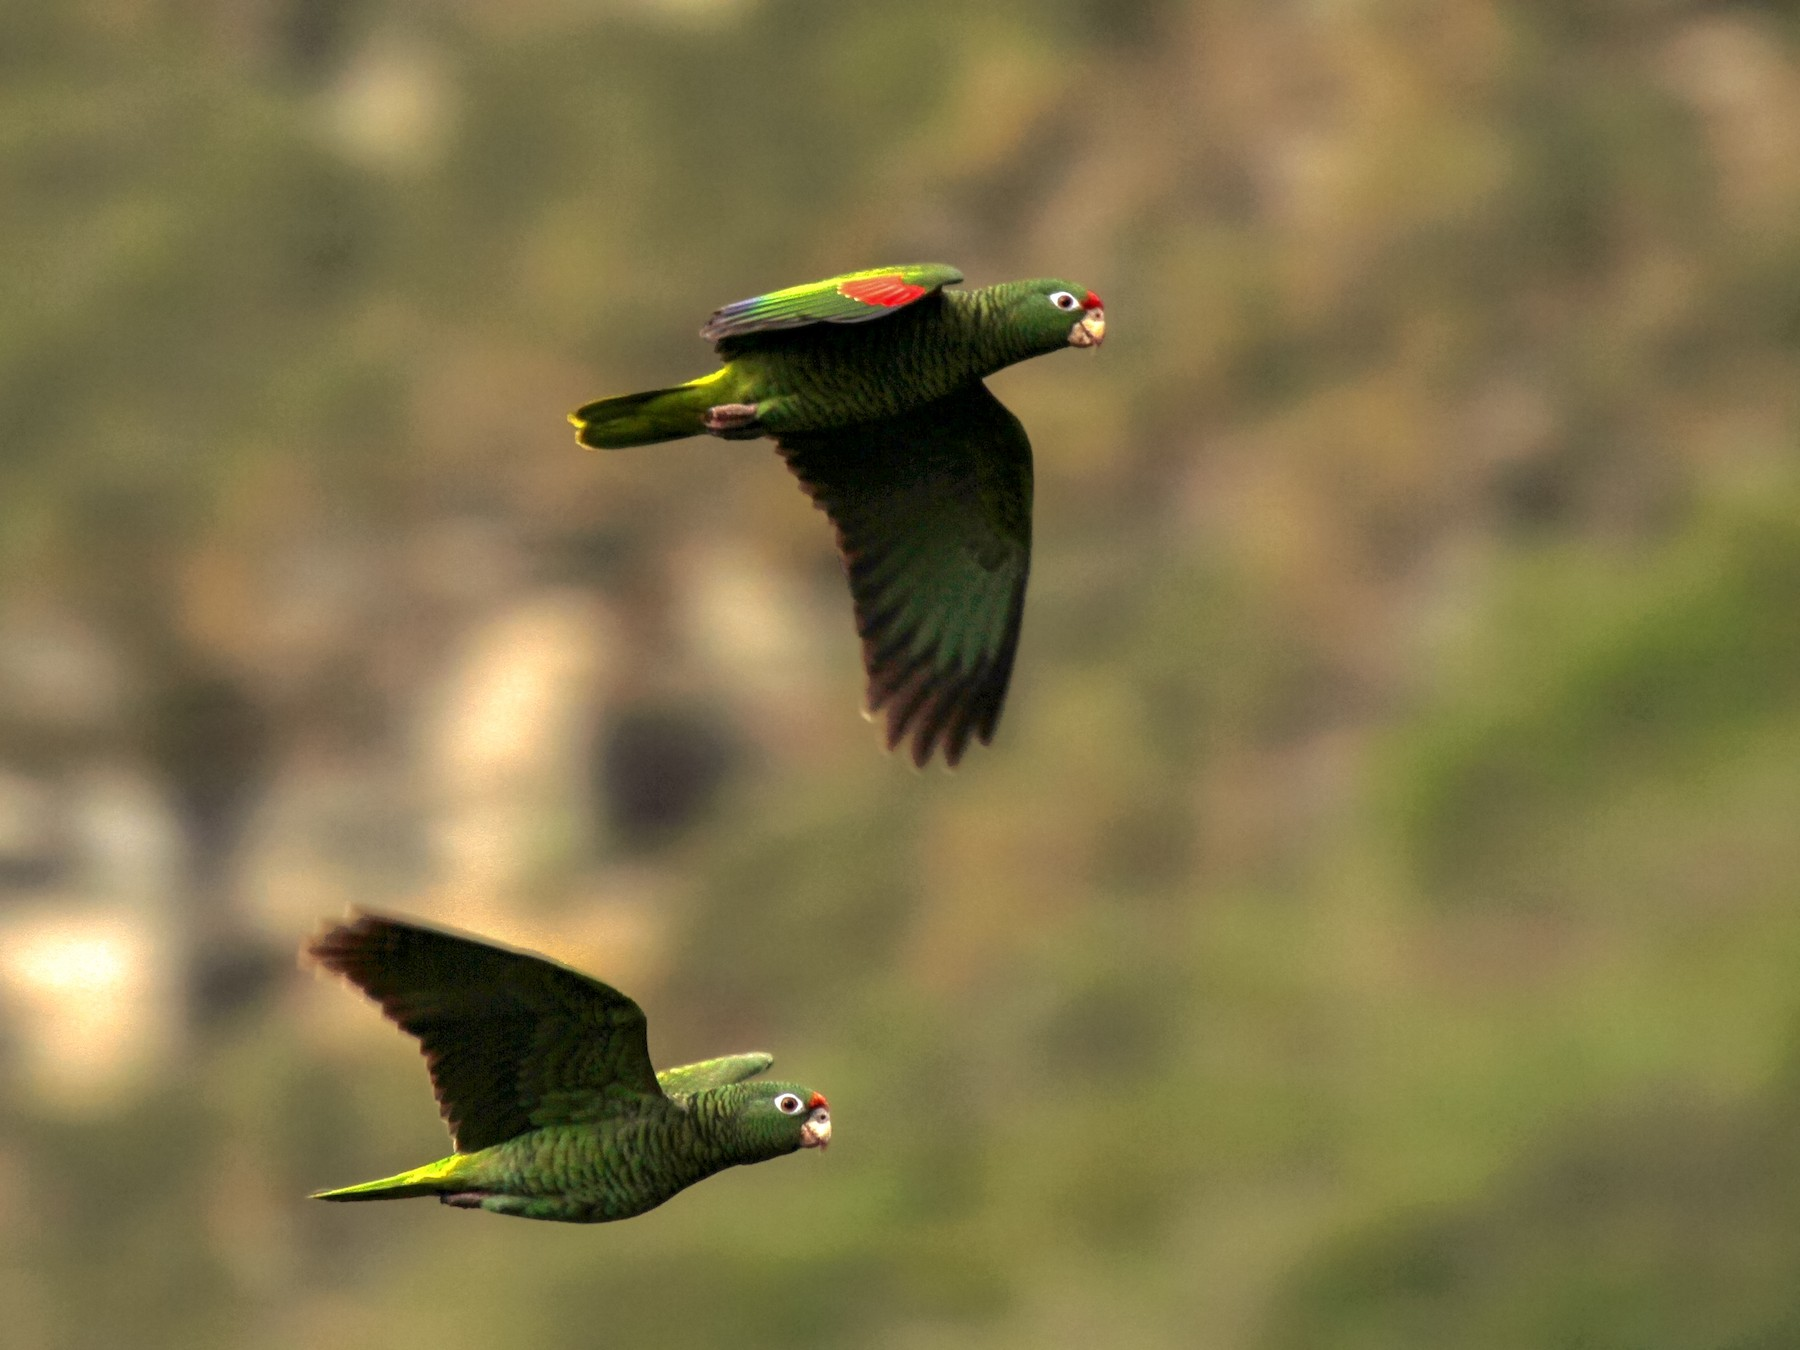 Tucuman Parrot - Richard Greenhalgh